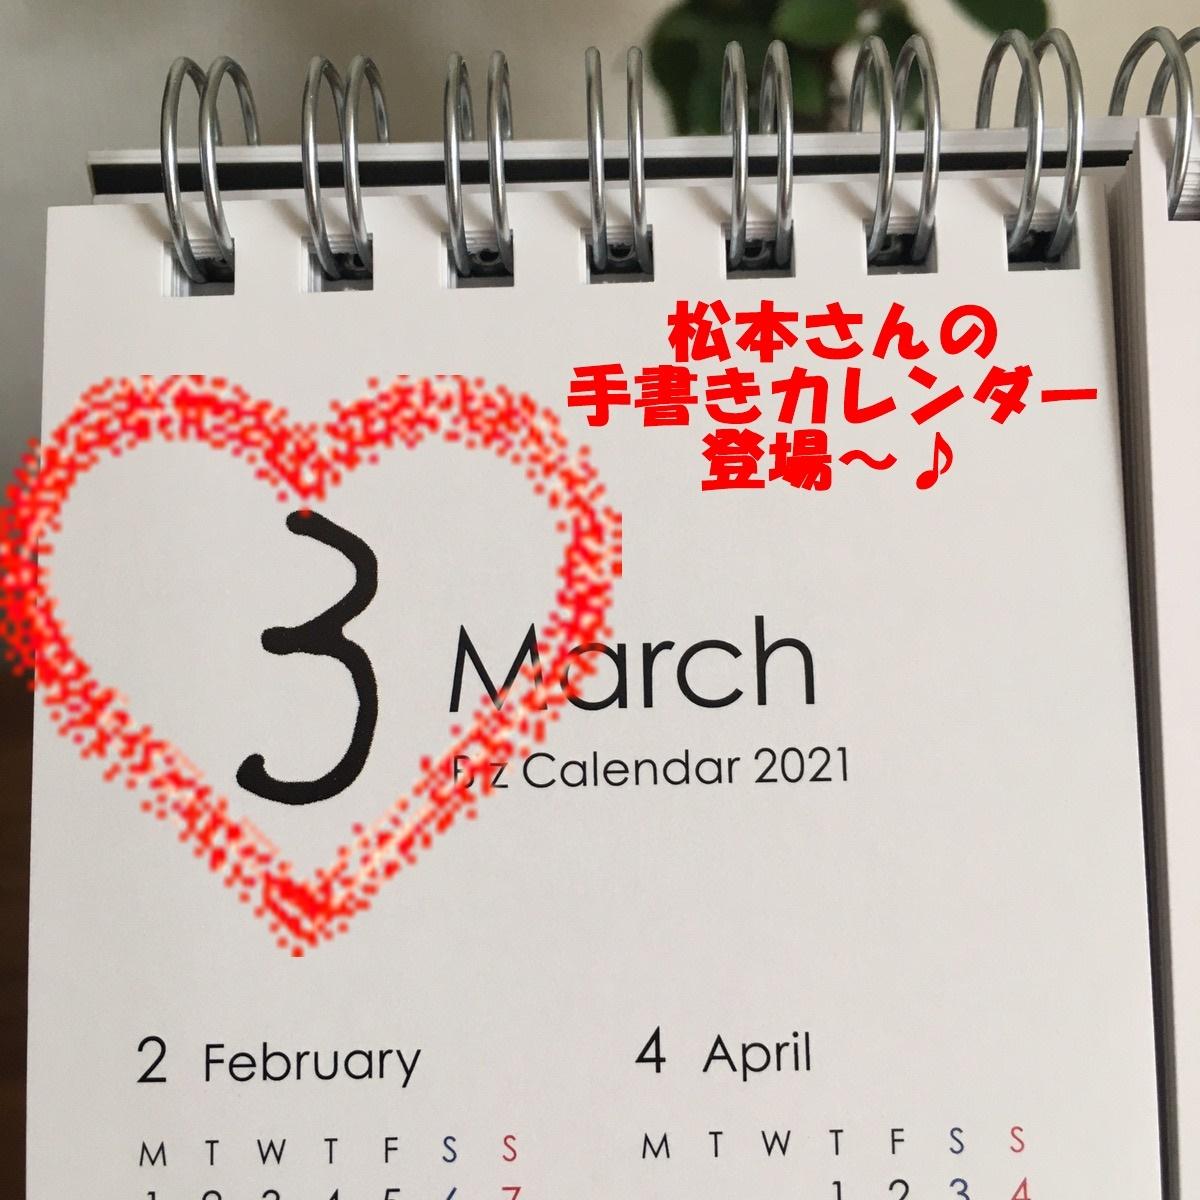 B'z卓上カレンダー松本孝弘3月